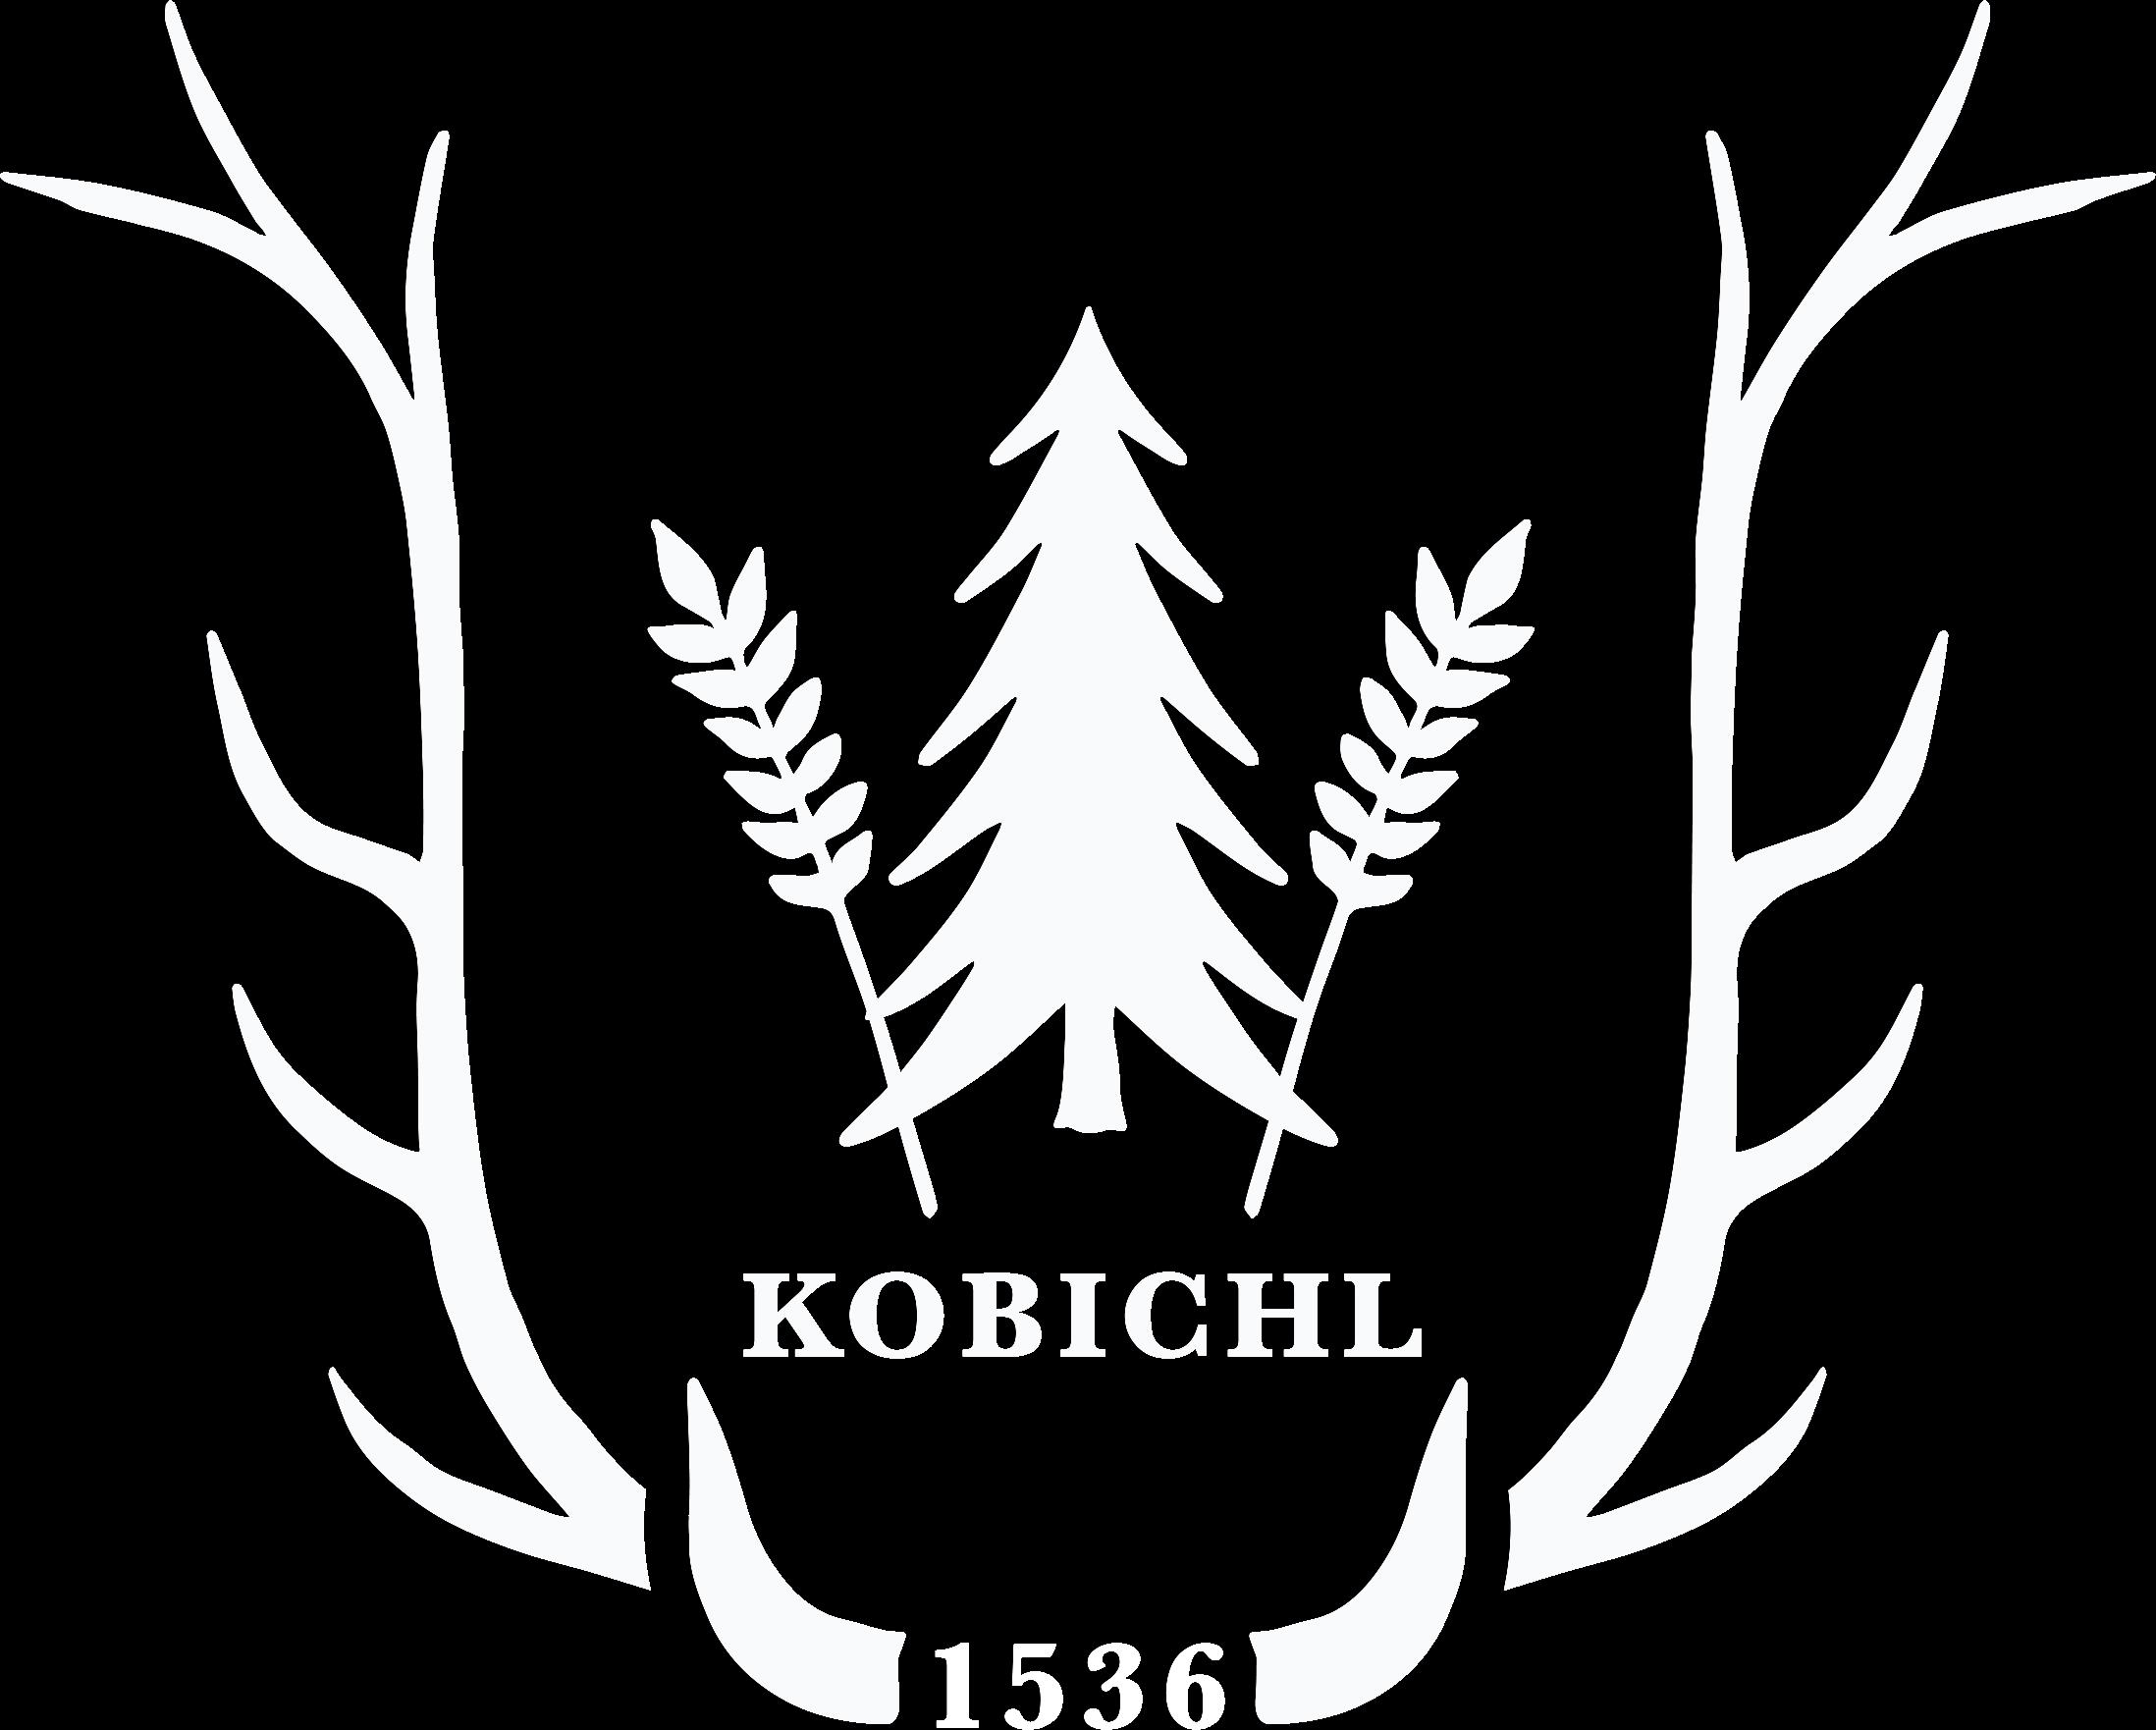 Kobichl